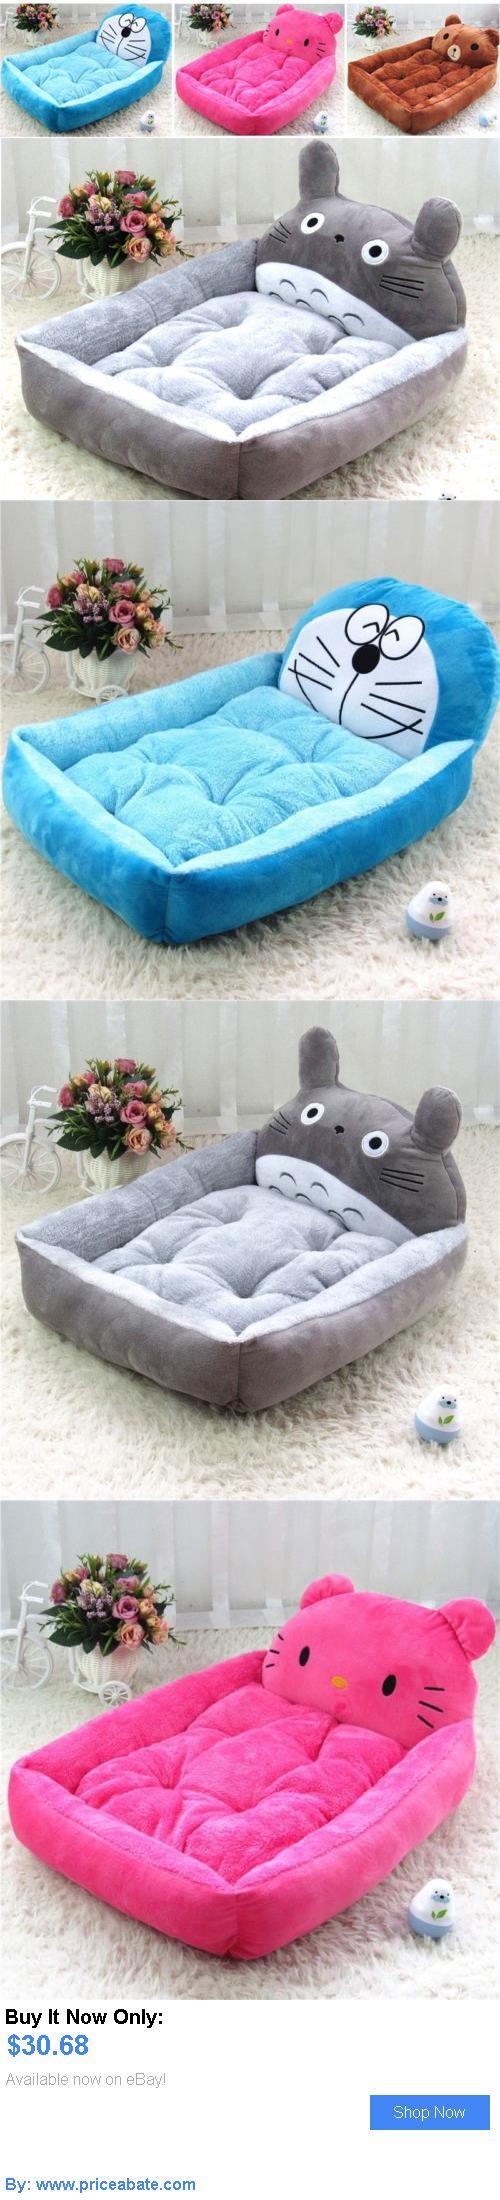 Animals Dog: Cartoon Animals Pet Supplies Dog Sleeping Bed House Kennel Cat Mat Pad Cushion-H BUY IT NOW ONLY: $30.68 #priceabateAnimalsDog OR #priceabate